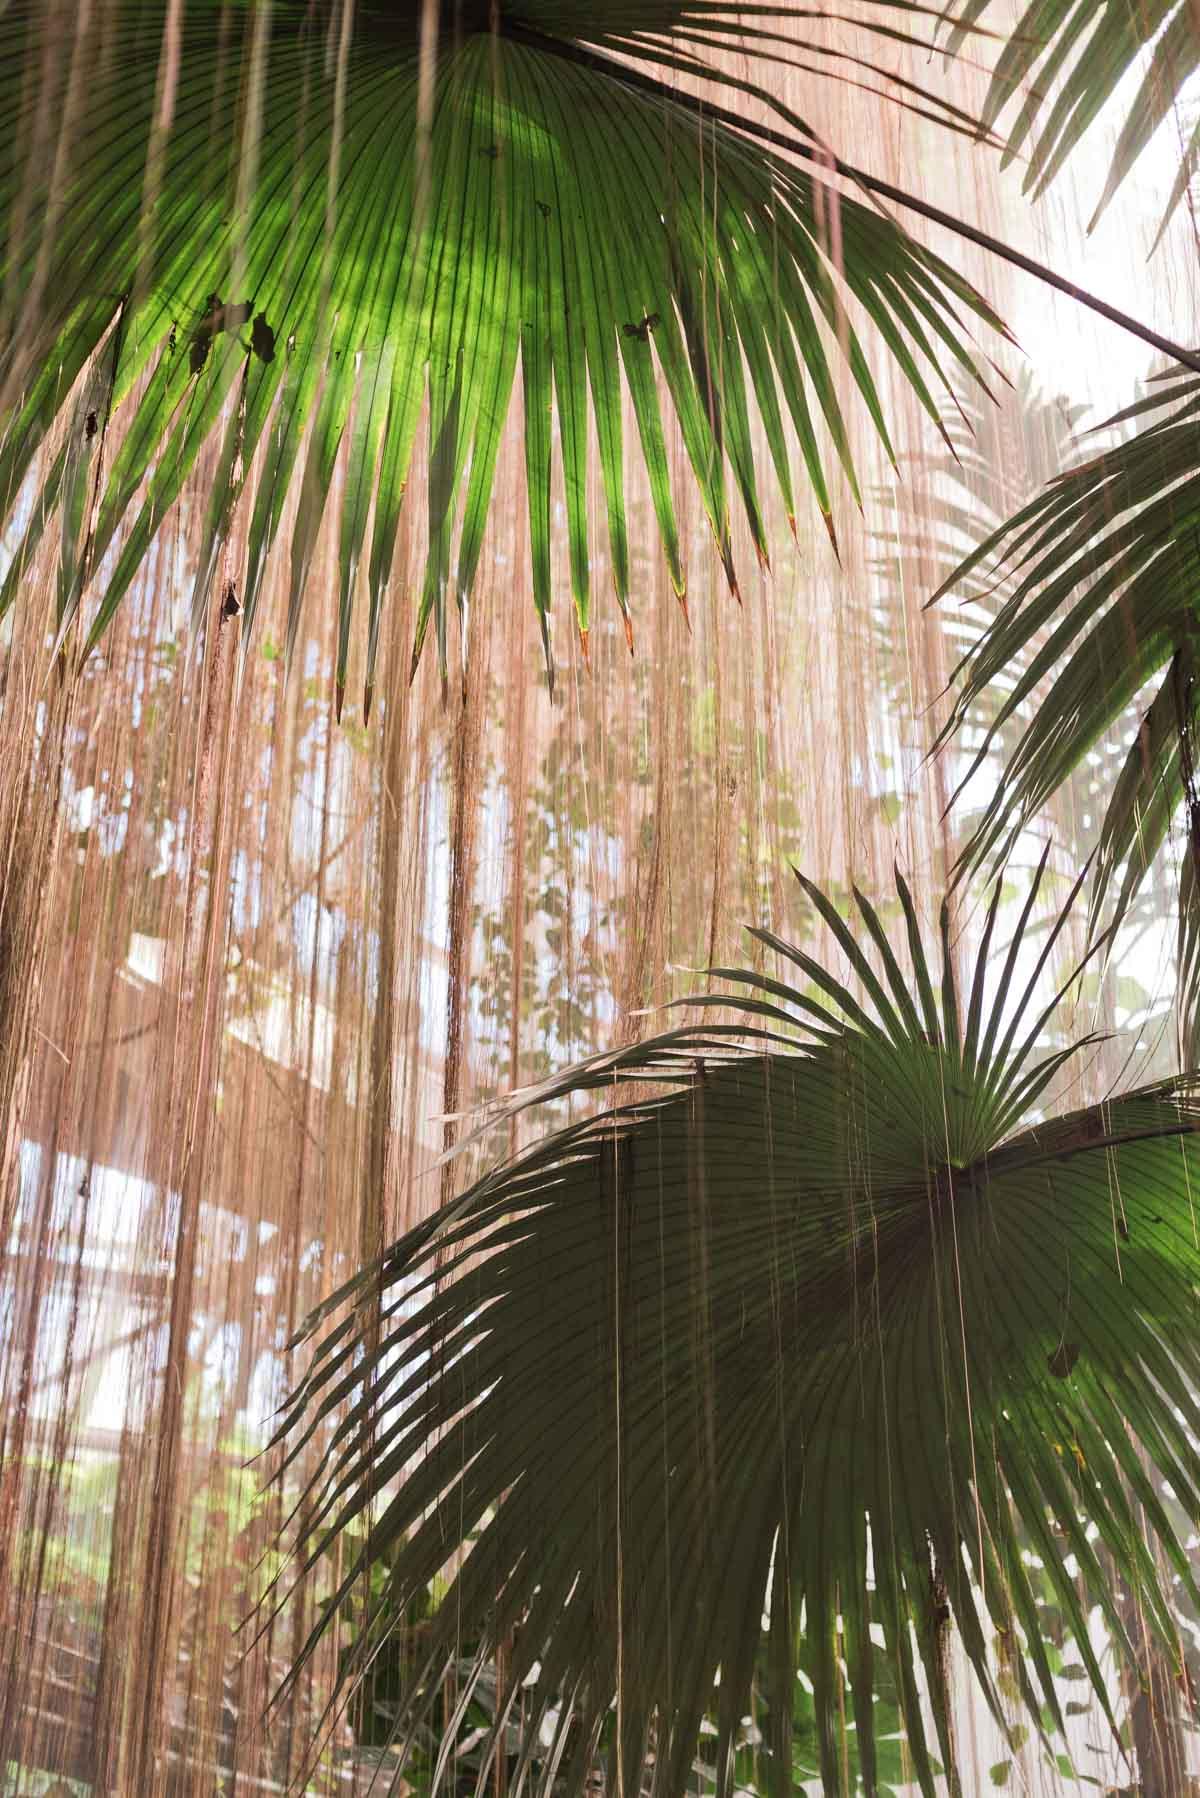 5 Unique Date Ideas That You Might Not Have Thought to Try. Idea #1: Botanical Gardens #dateideas #uniquedate #botanicalgarden #tropical #plants